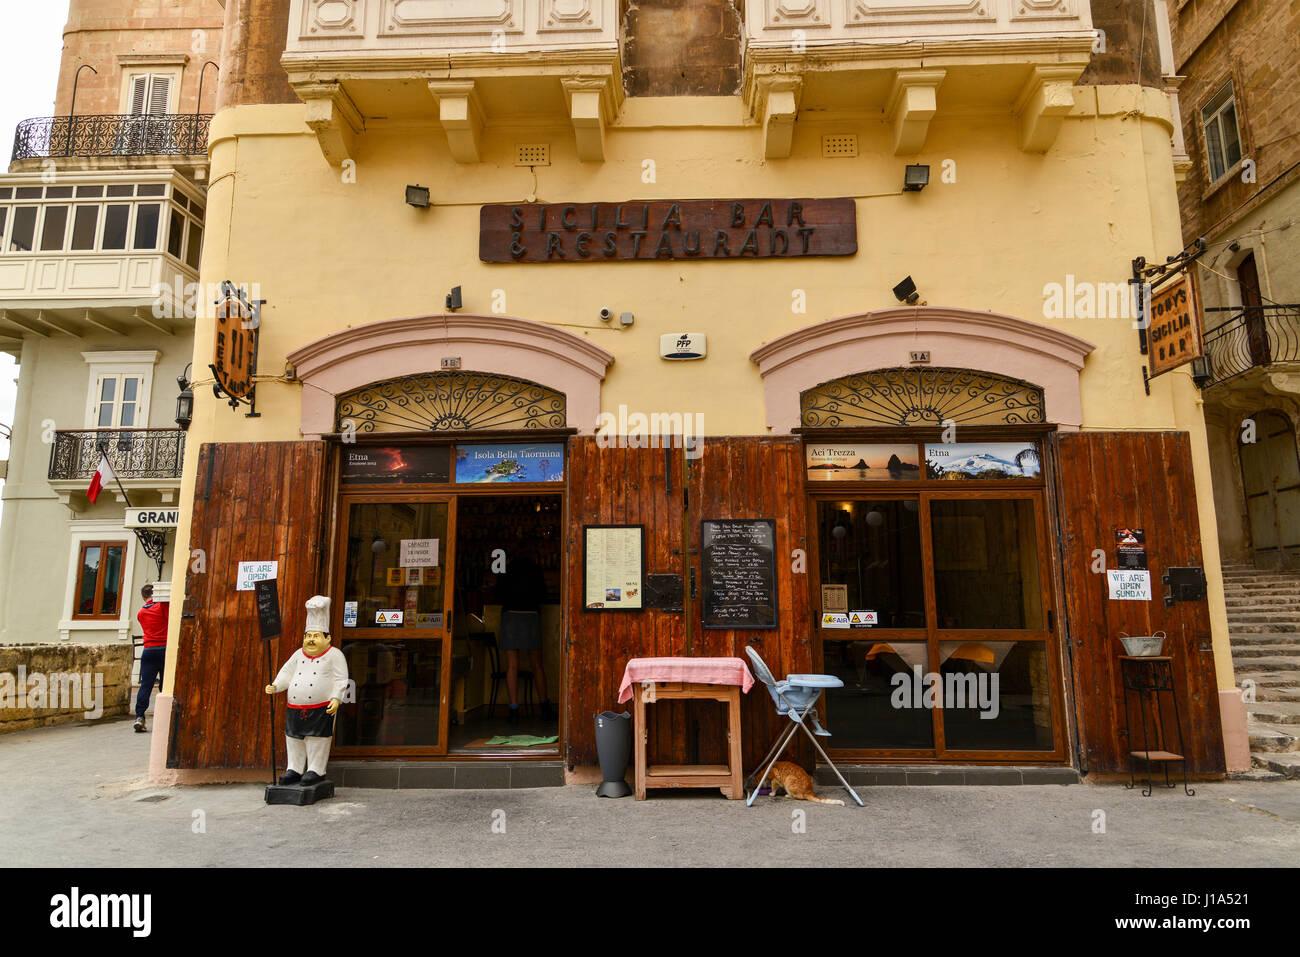 Tony's Sicilia Bar & Restaurant, St. Johns Street, Valletta, Malta - Stock Image